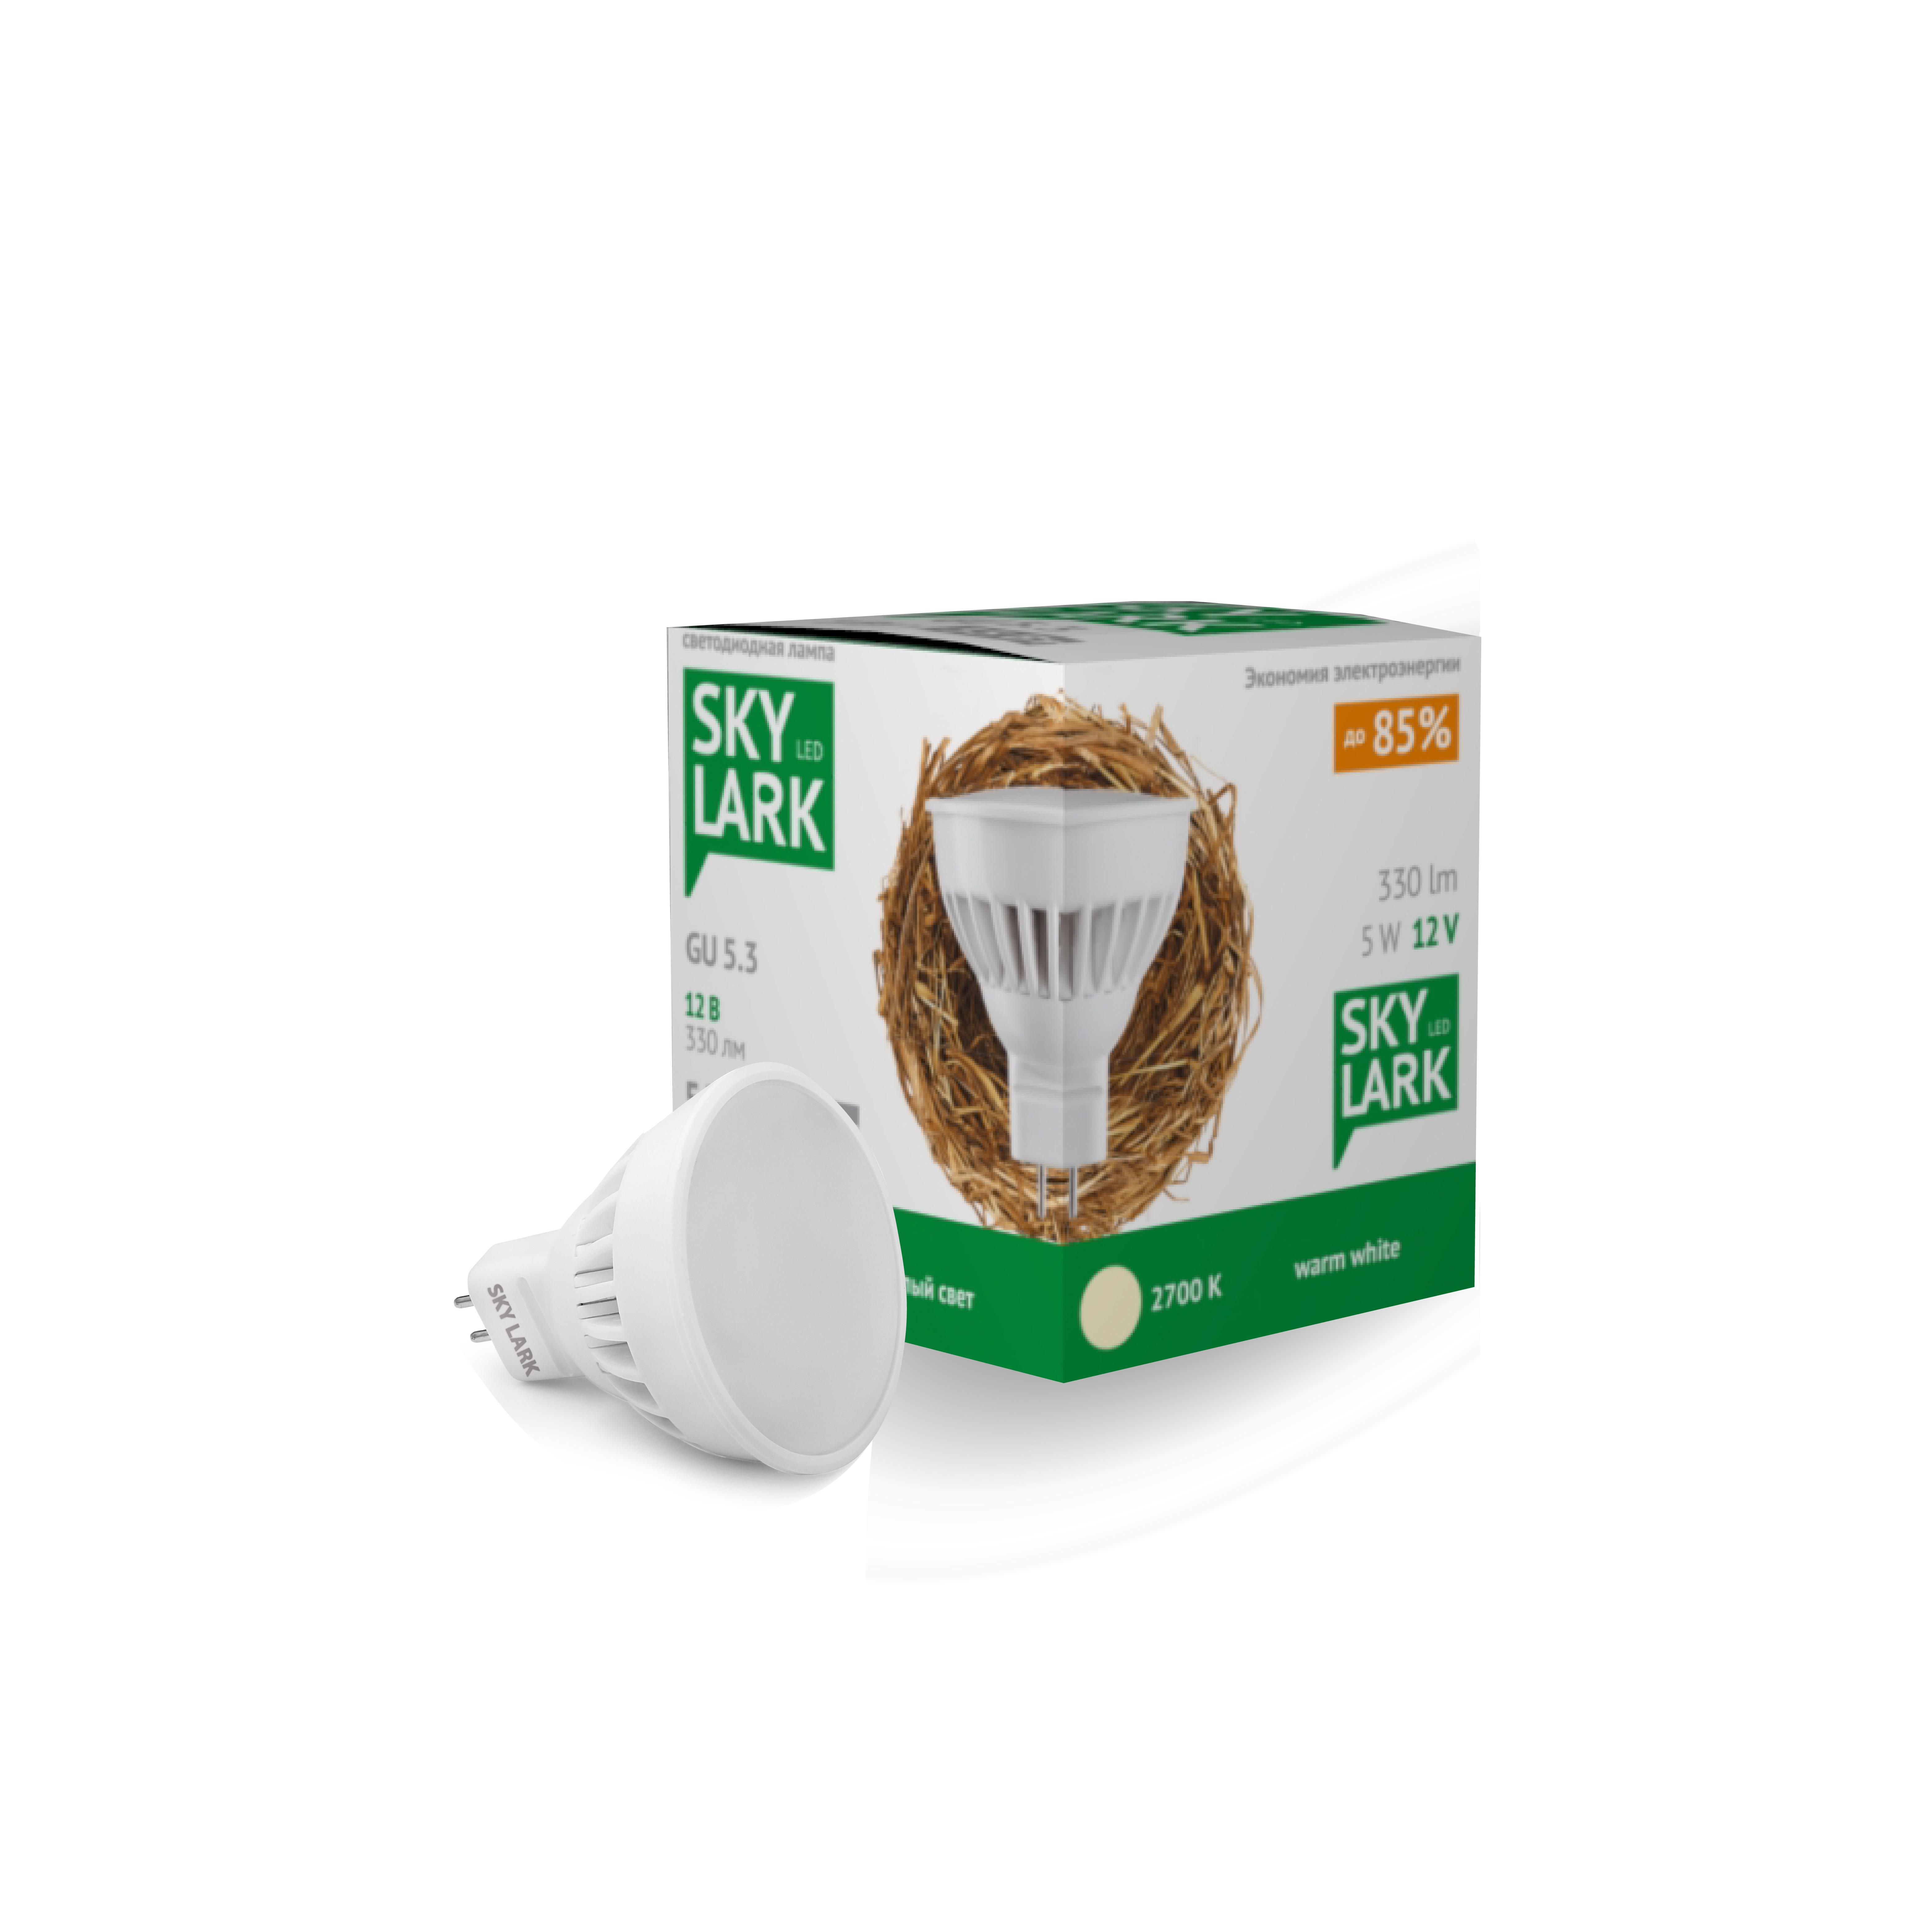 Лампа светодиодная Skylark B029 skylark светодиодная лампа skylark gu5 3 5w 3500k рефлекторная матовая b030